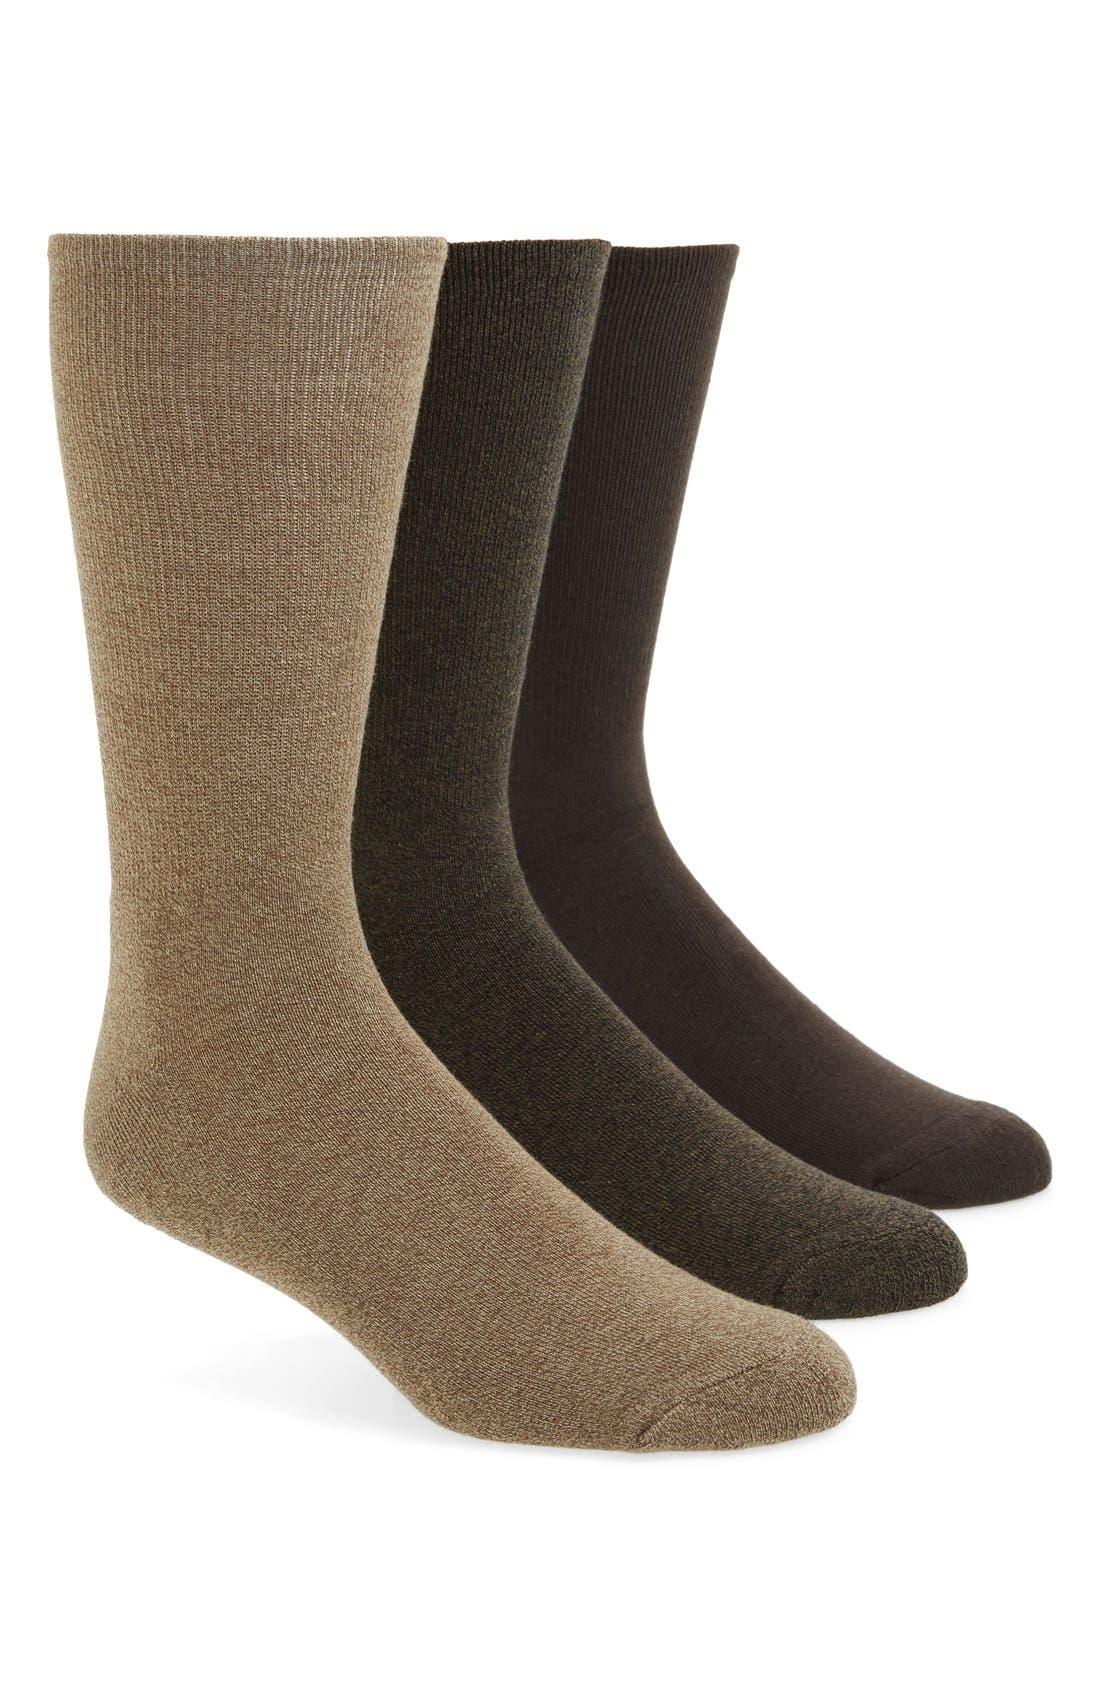 CALVIN KLEIN,                             3-Pack Cotton Blend Socks,                             Main thumbnail 1, color,                             BEIGE